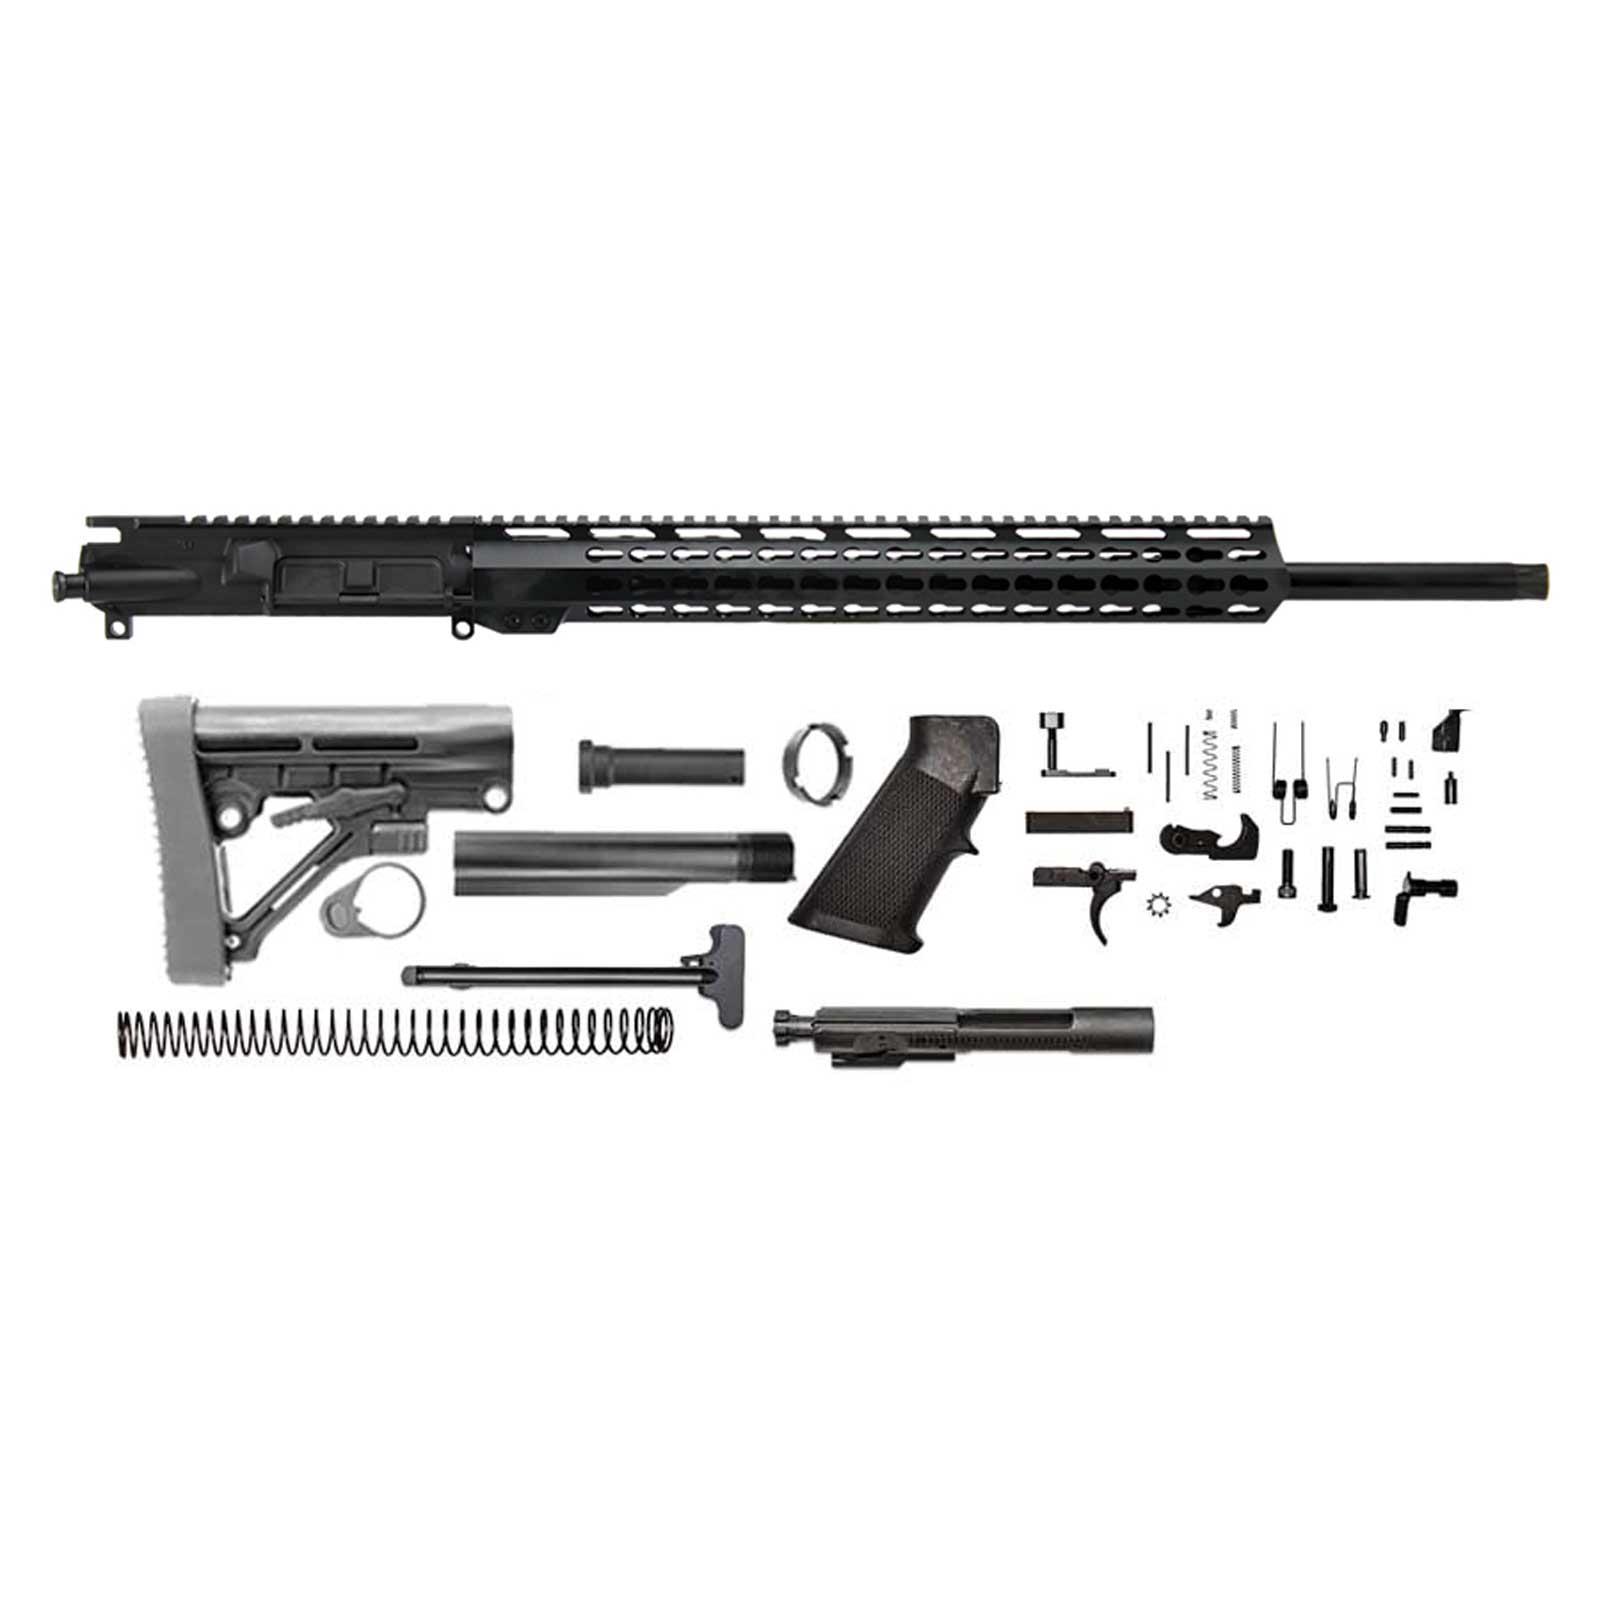 ar15-rifle-kit-20-224-valkyrie-nitride-17-15-keymod-205893-2